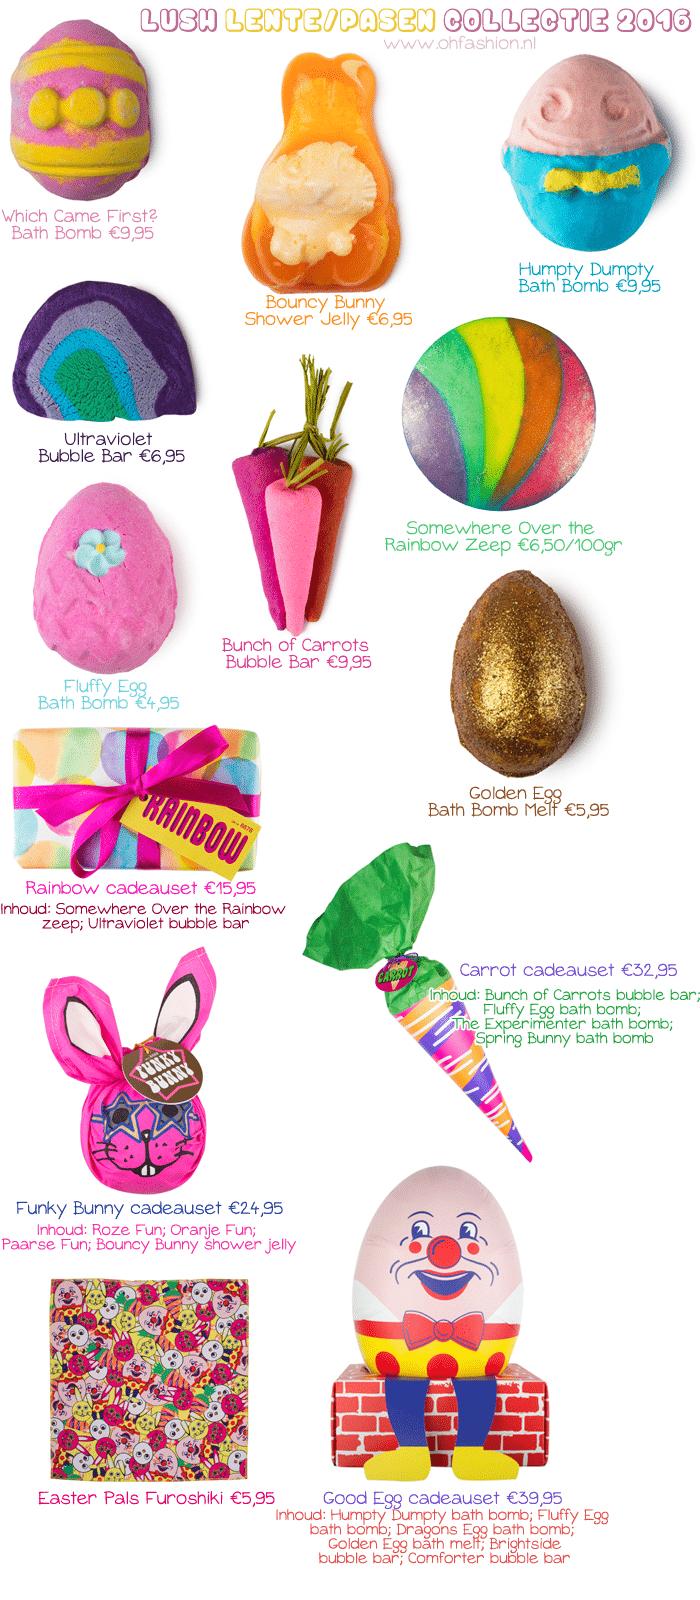 LUSH Voorjaar: Pasen & Moederdag